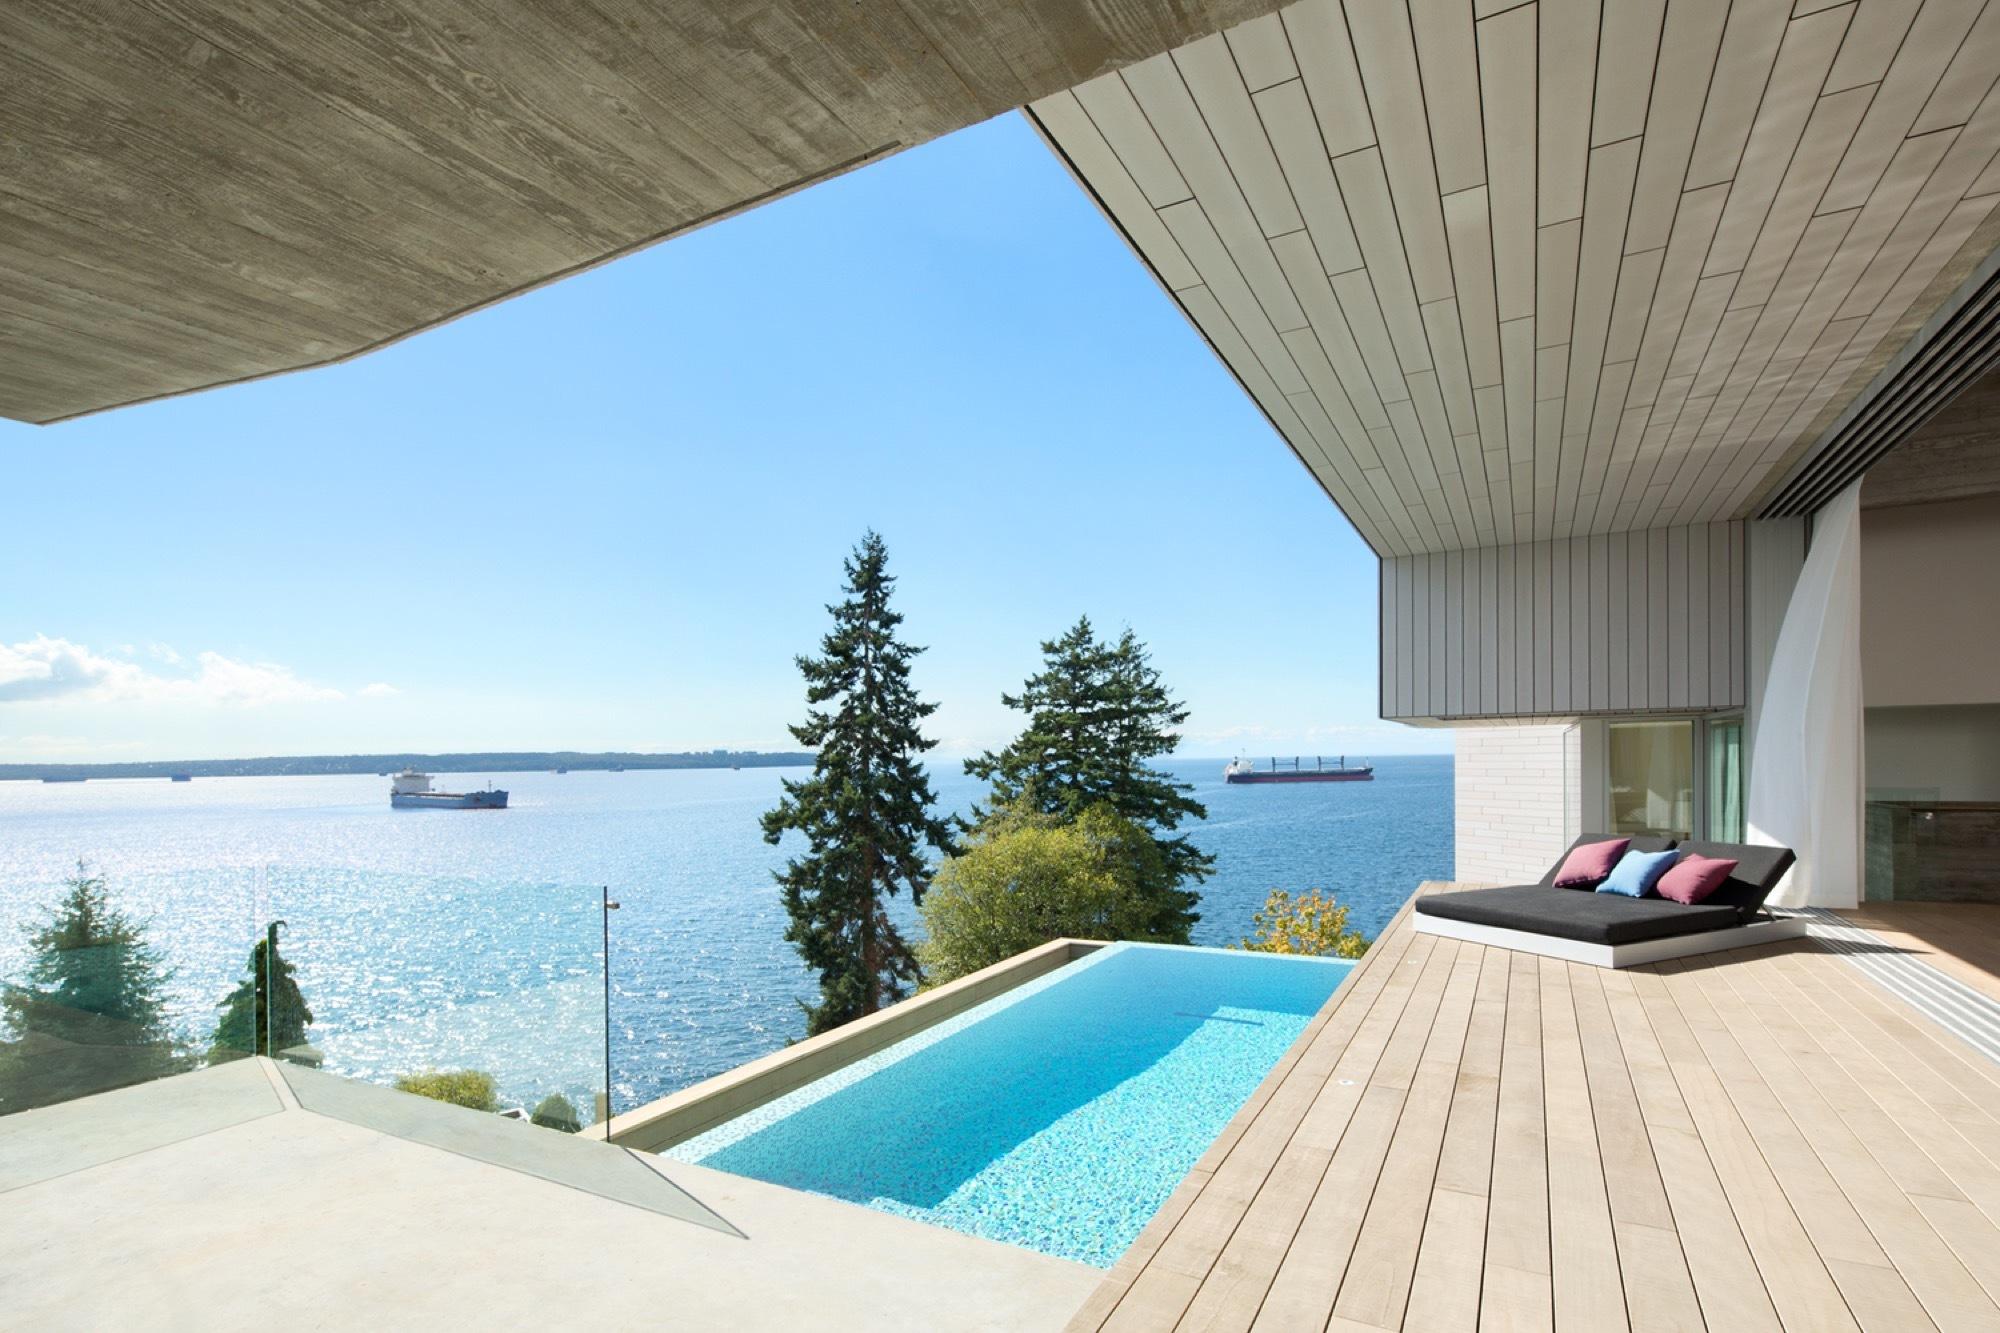 Gallery of sunset house mcleod bovell modern houses 10 for Pool design vancouver